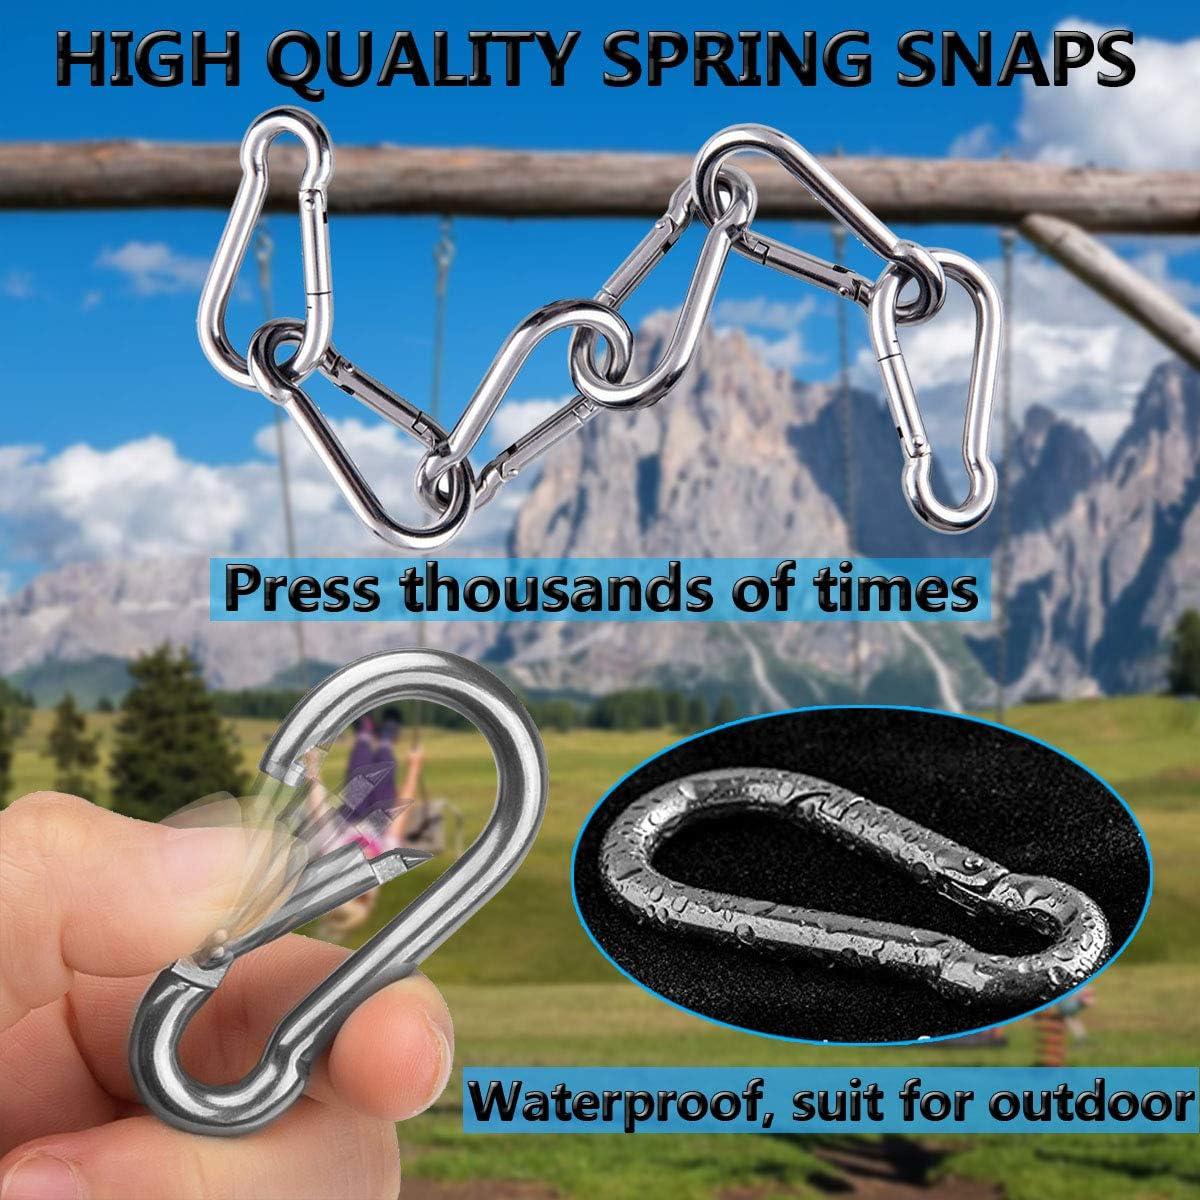 Ekunbuy Carabiner Clips 304 Stainless Steel Spring Snap Hooks Spring Clips Keychain Link Buckle Rope Connector for Camping Hiking Swing Gym Hammock